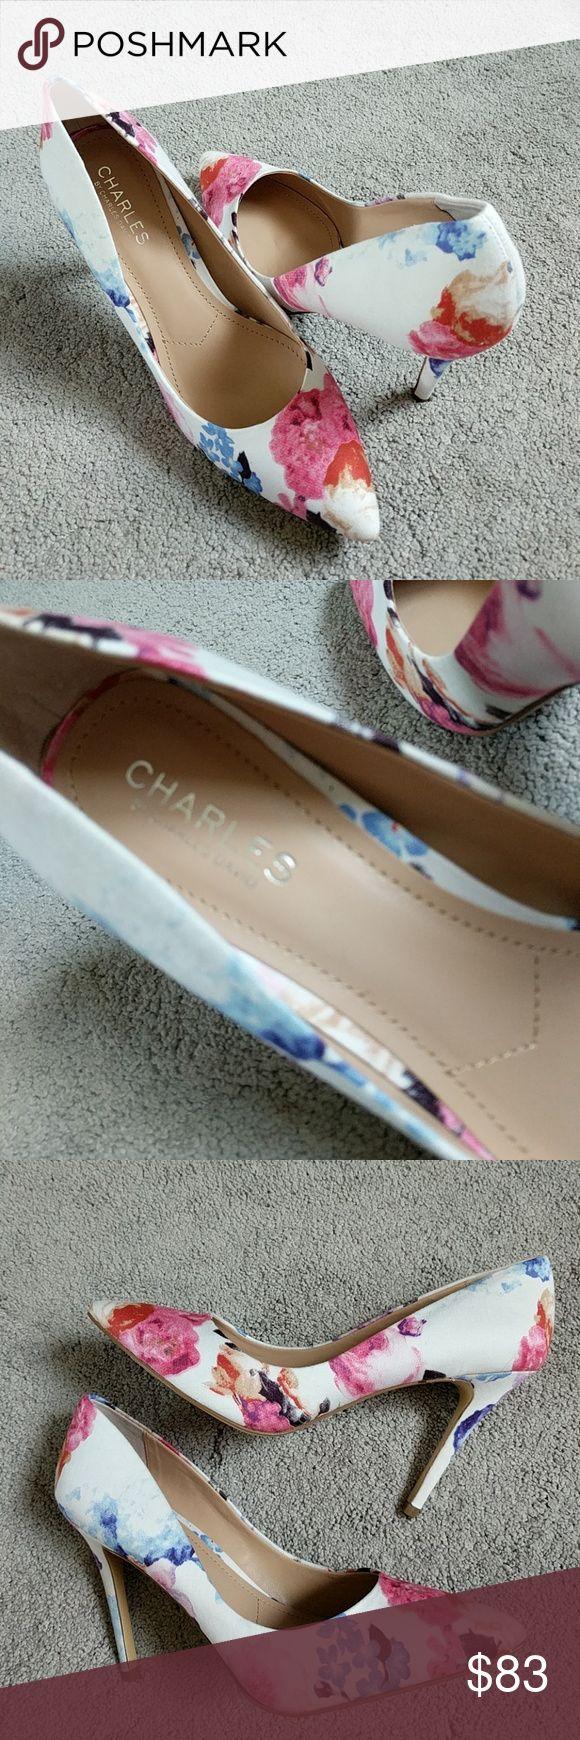 "⭐ Charles David Floral Heels 4.25"" heels Canvas fabrics upper Brand new, no box Charles David Shoes Heels"